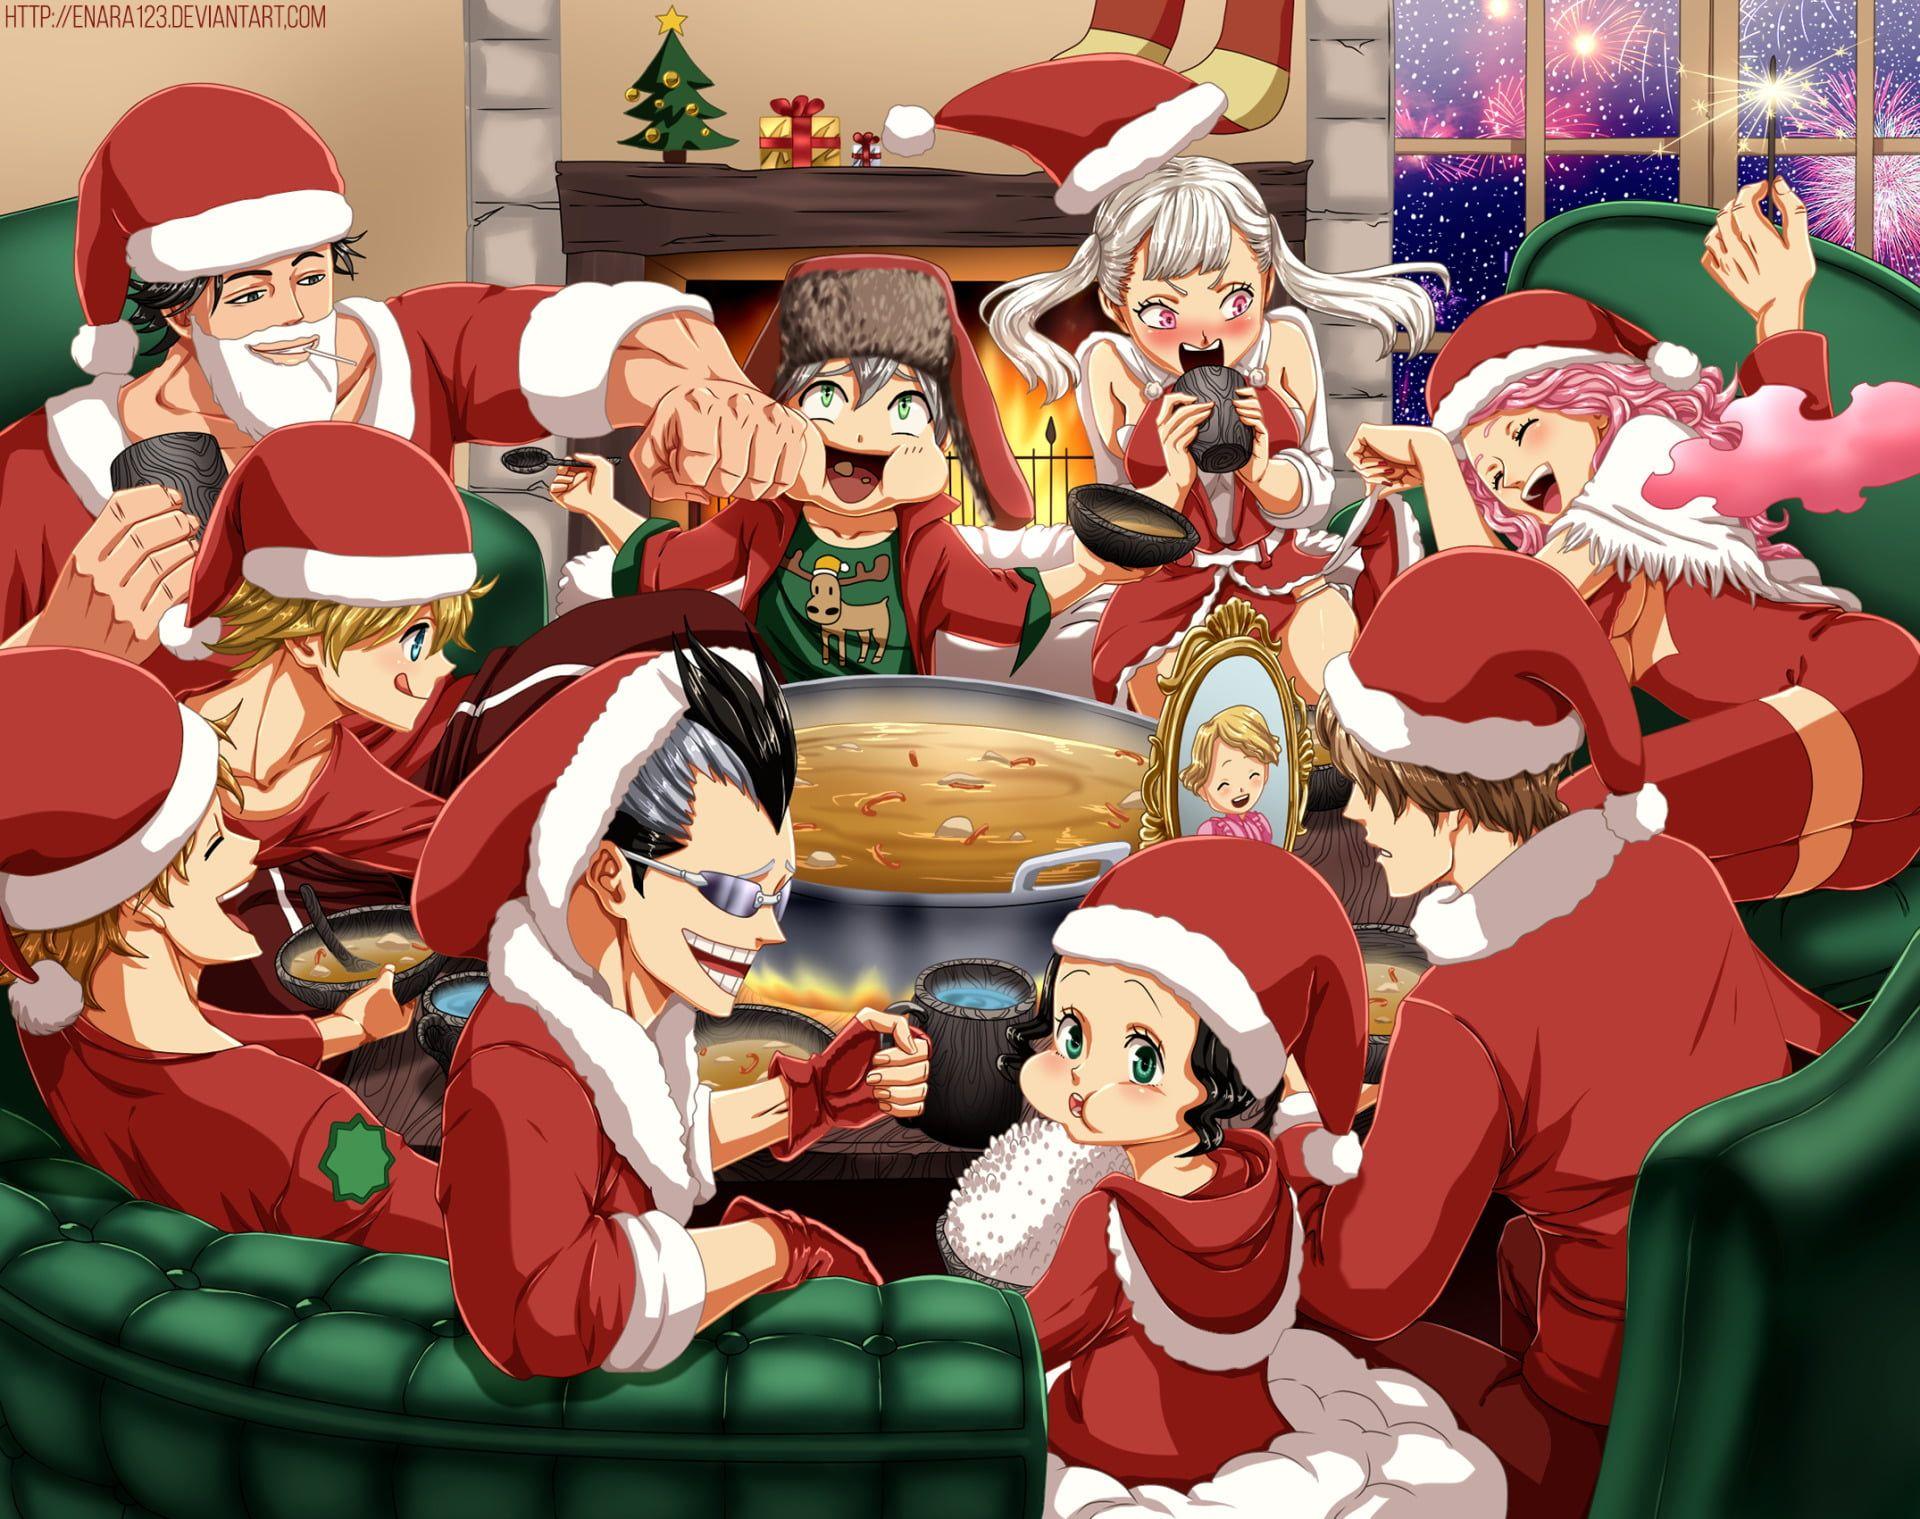 Anime Black Clover Asta Black Clover Luck Voltia Magna Swing Noelle Silva Vanessa Enoteca Yami Sukehir In 2020 Black Clover Anime Anime Christmas Black Clover Manga